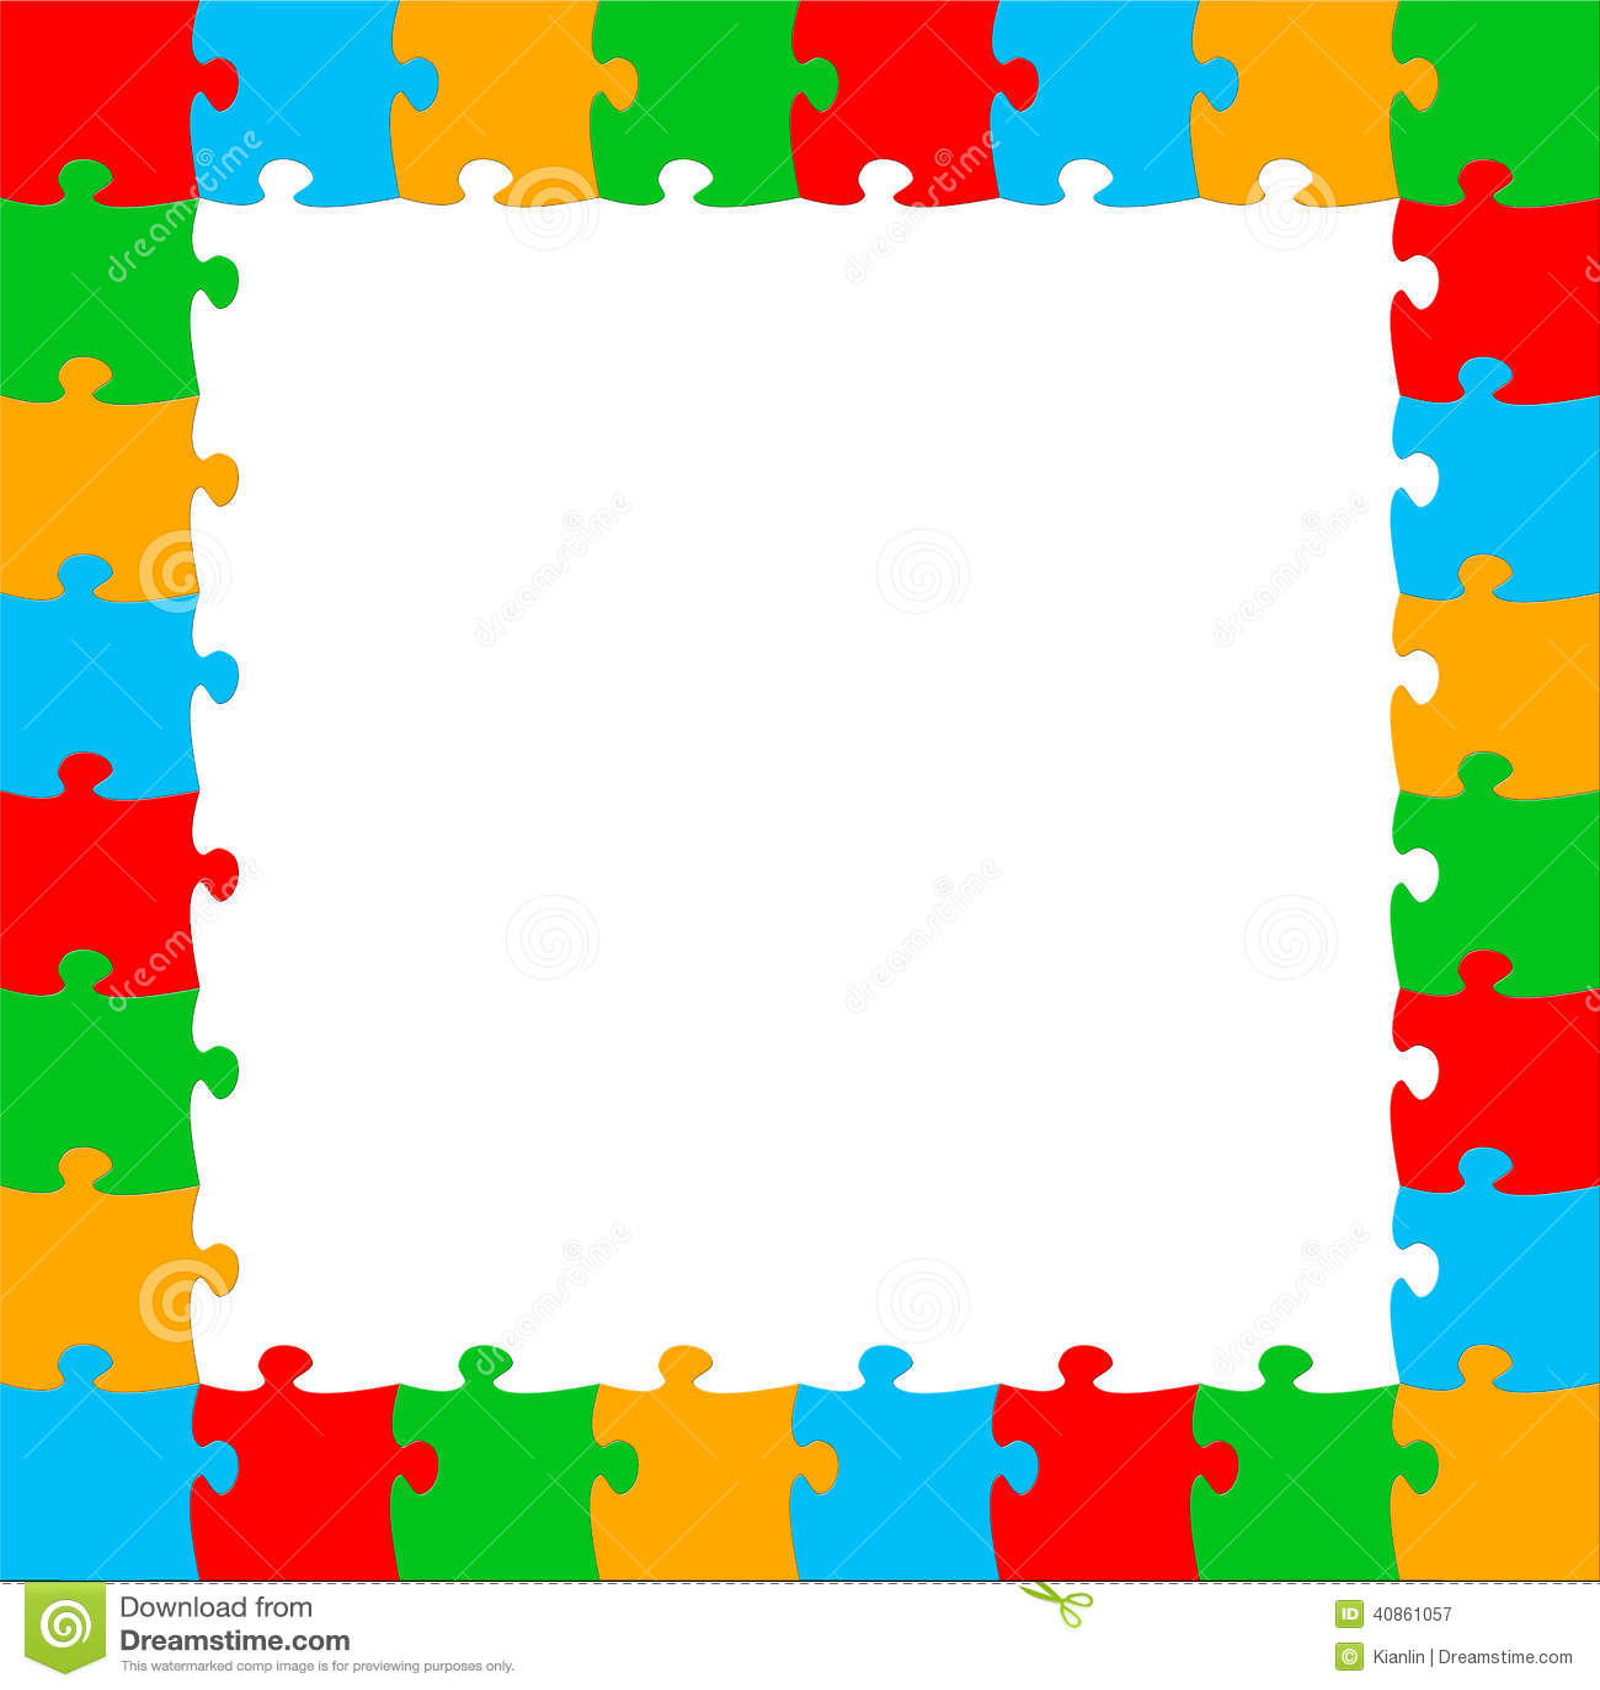 Puzzle Piece Picture Frame Template Bunte Puzzleteile